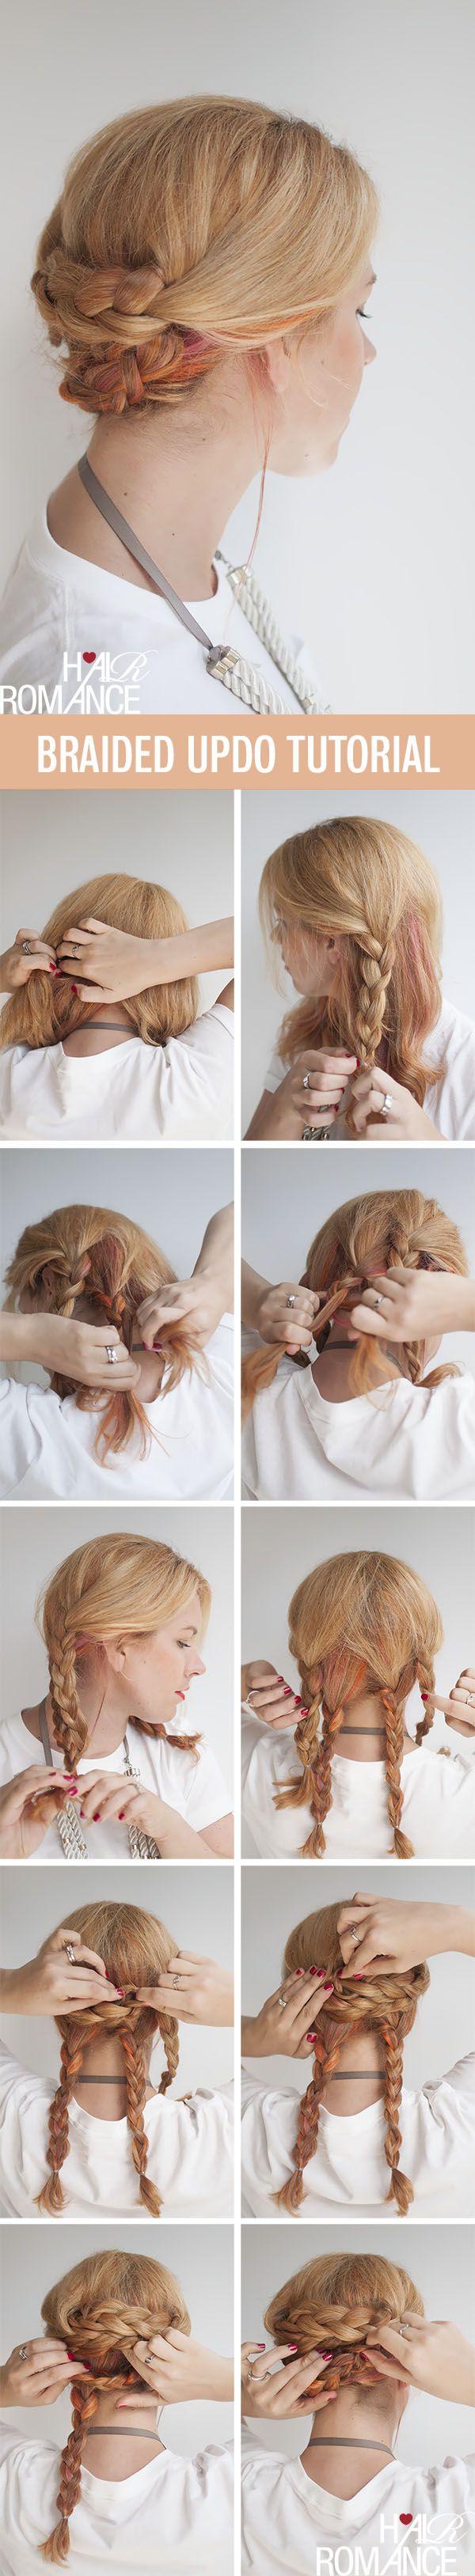 Braid Hair Tutorials: 12 Ways to Braid Your Hair | Hairstyles Weekly